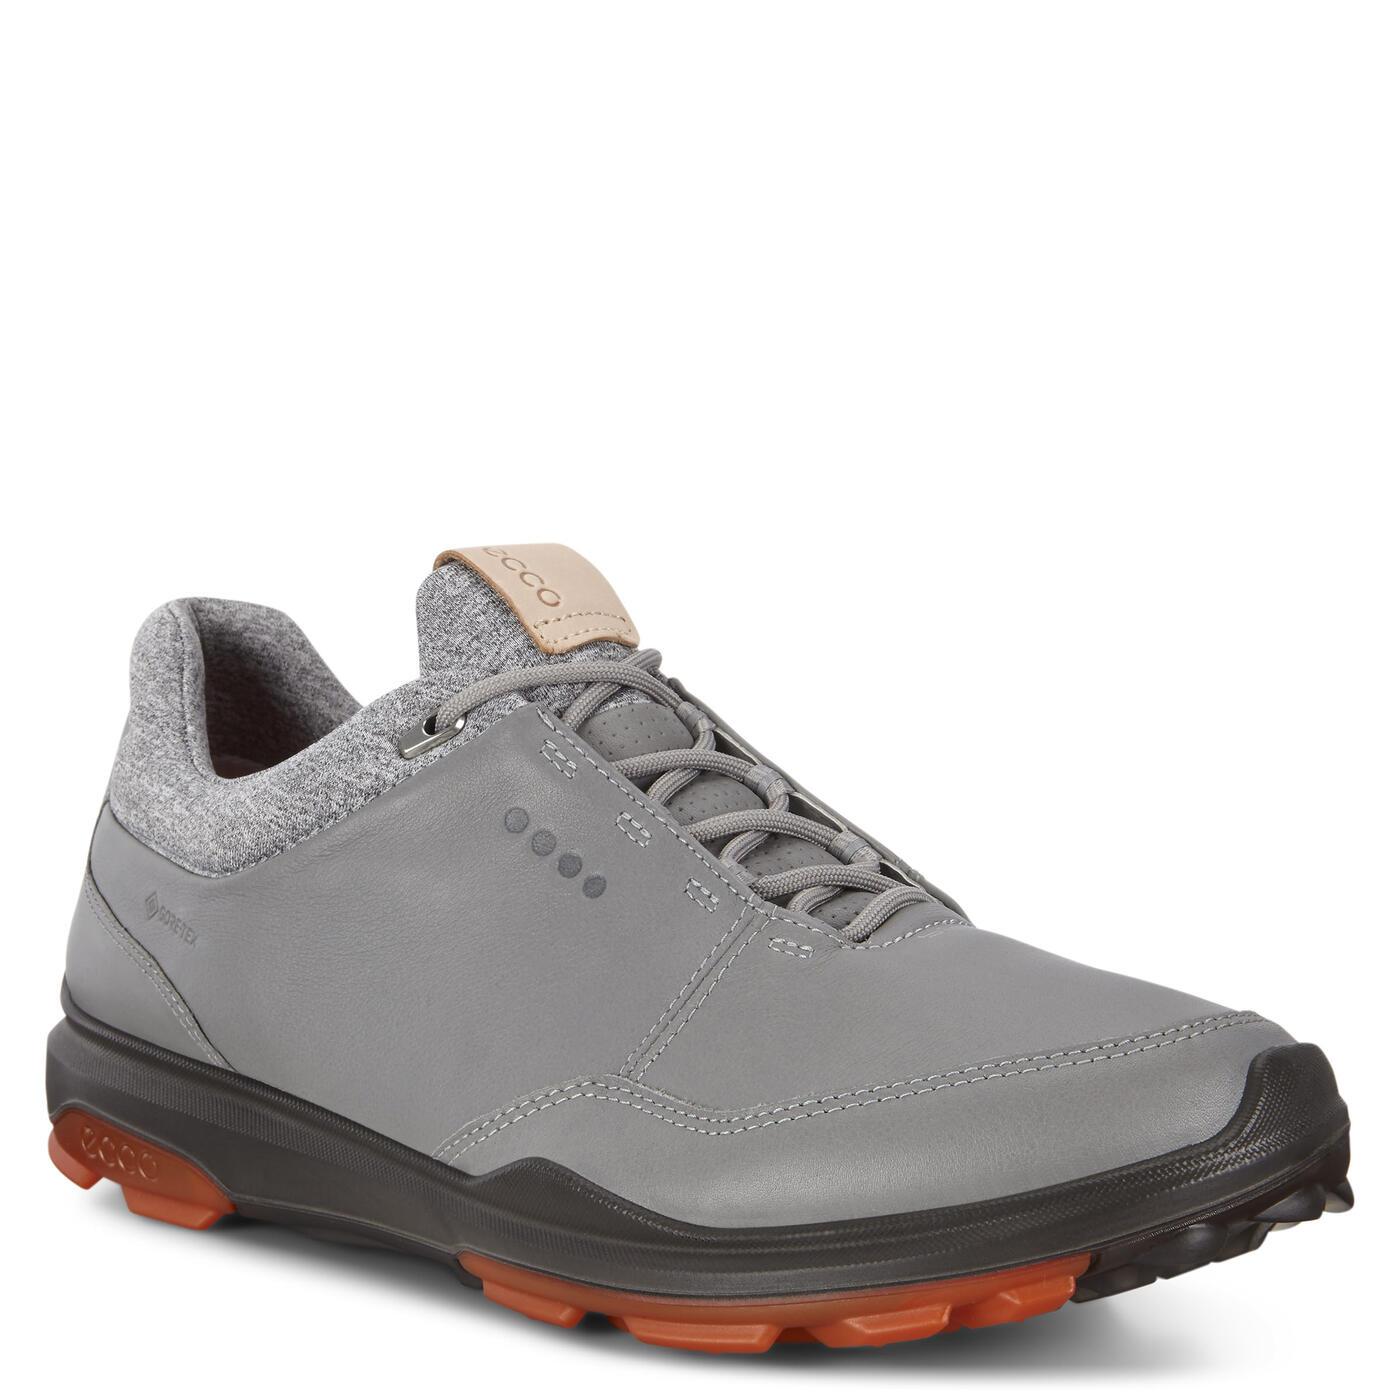 ECCO Men's Biom Hybrid 3 GTX Golf Shoe